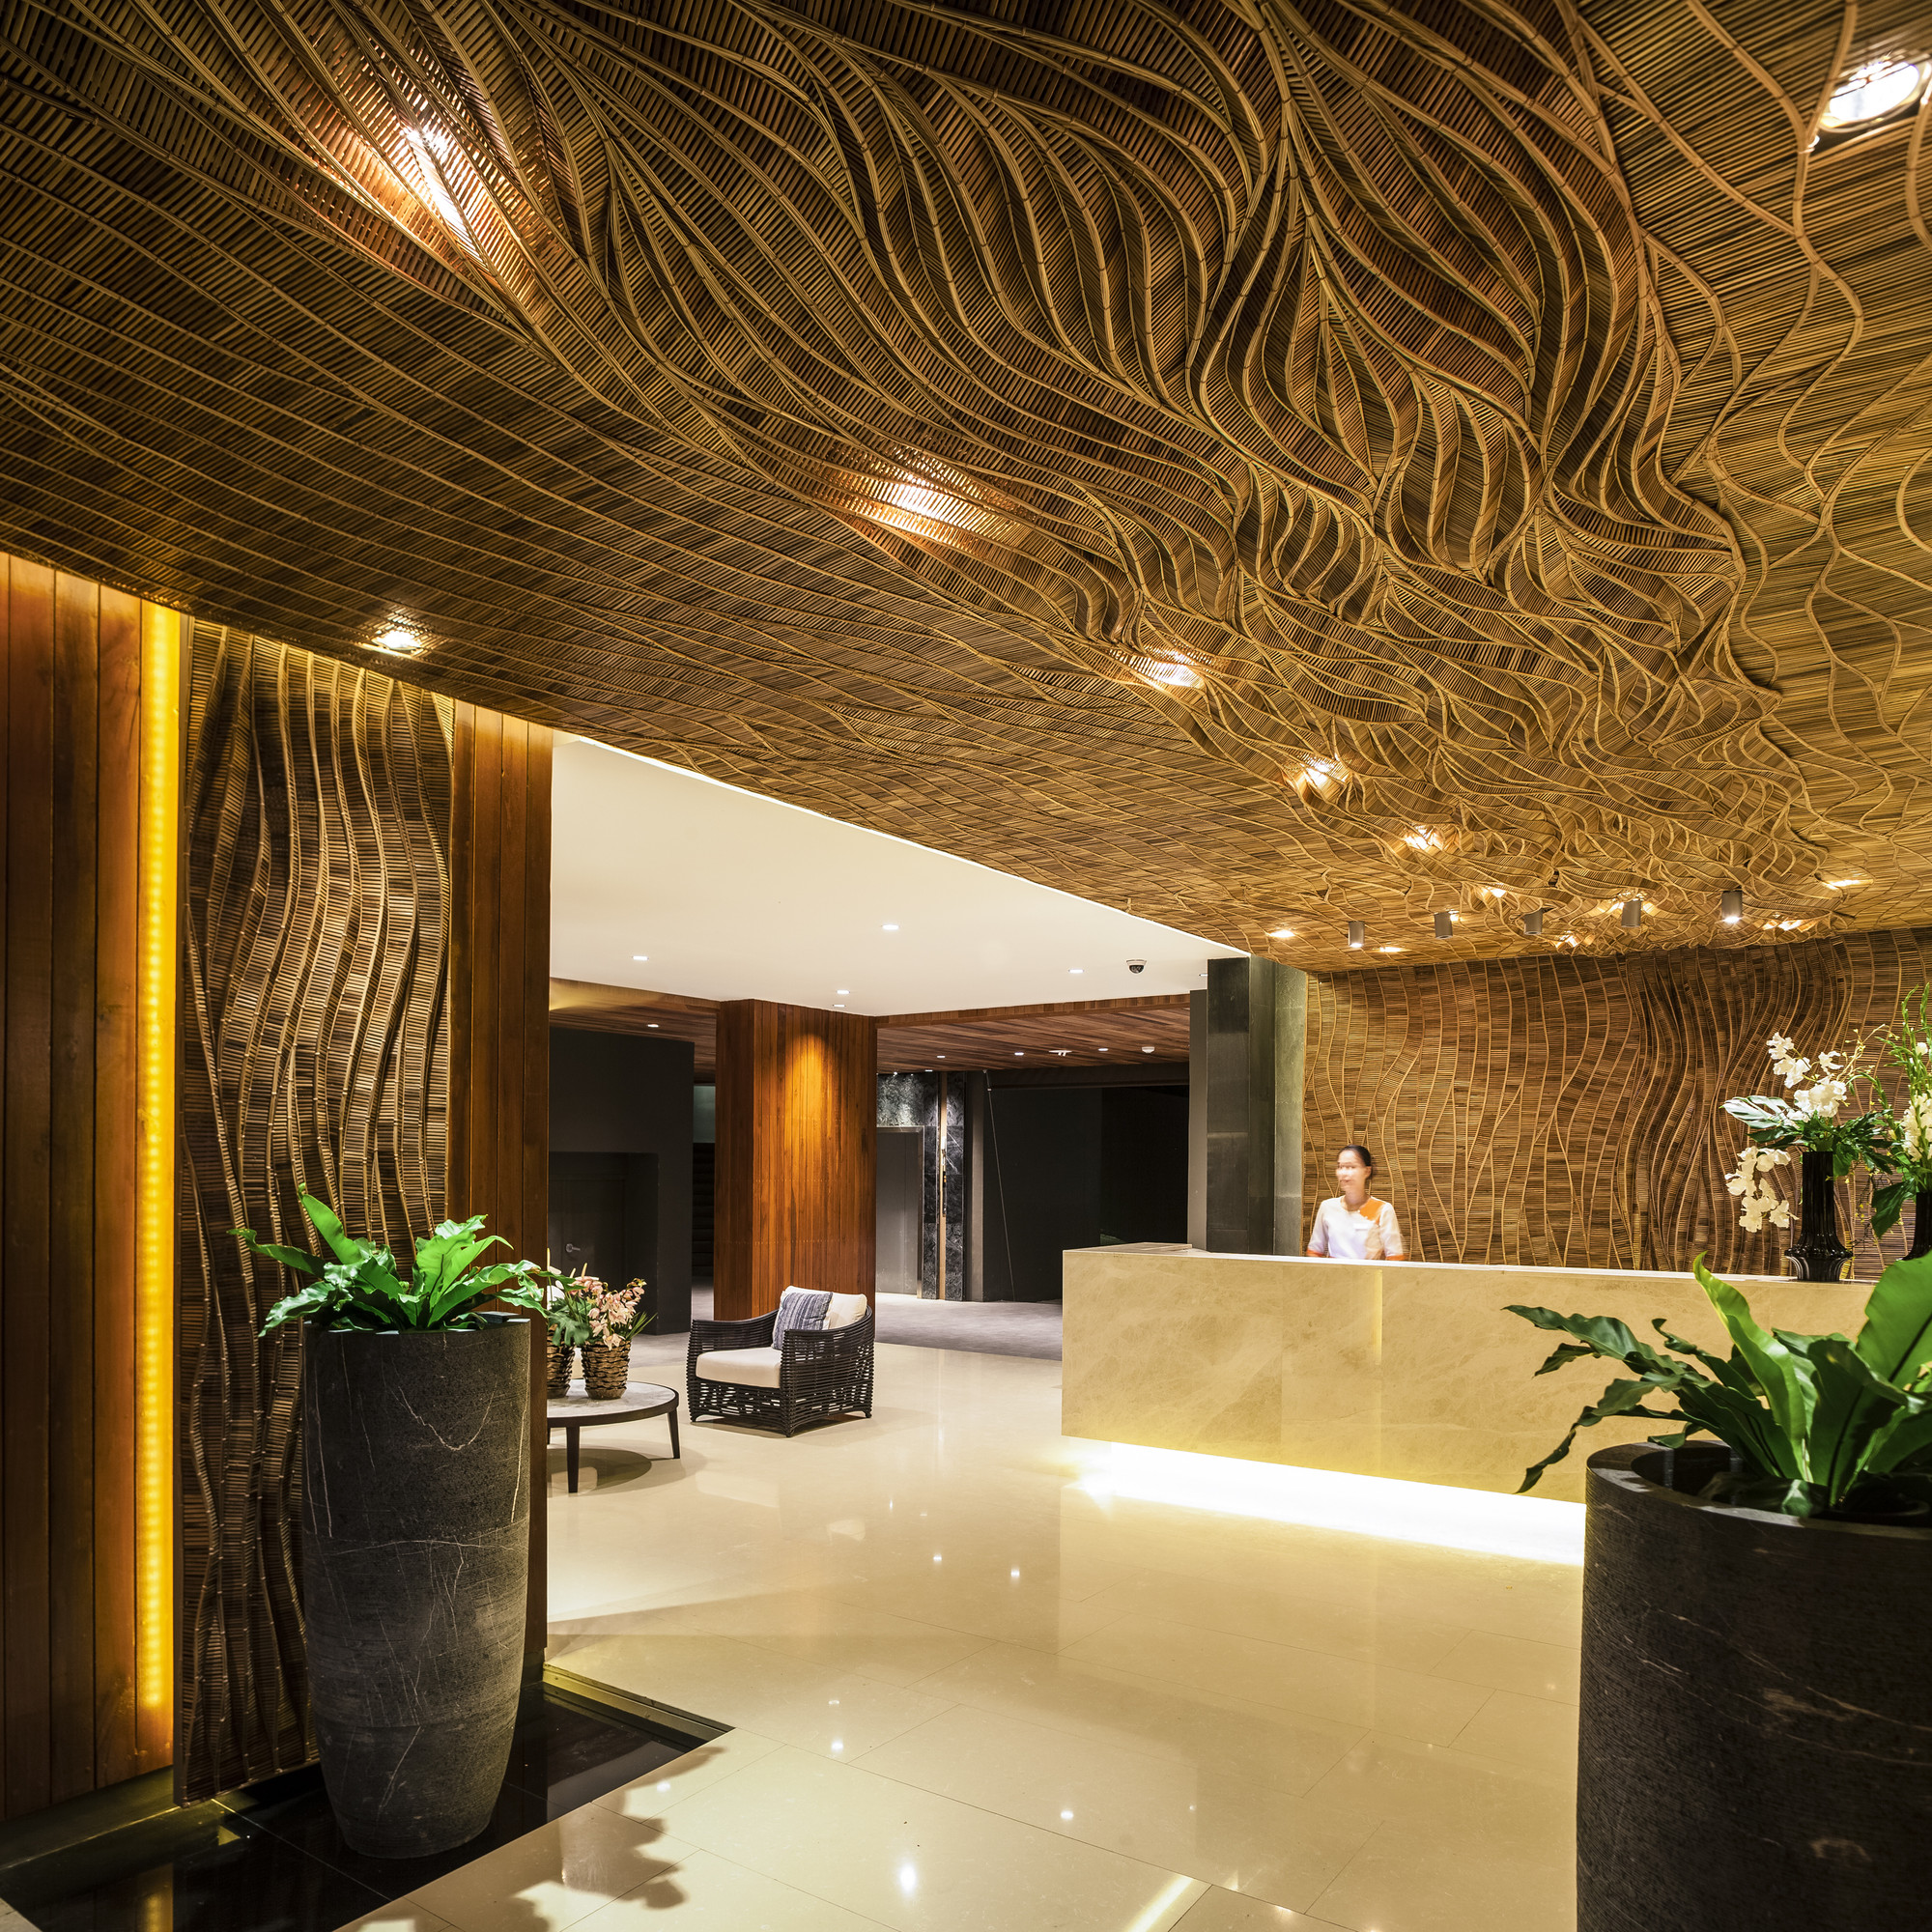 Thailand Spas Lobby Interior Design